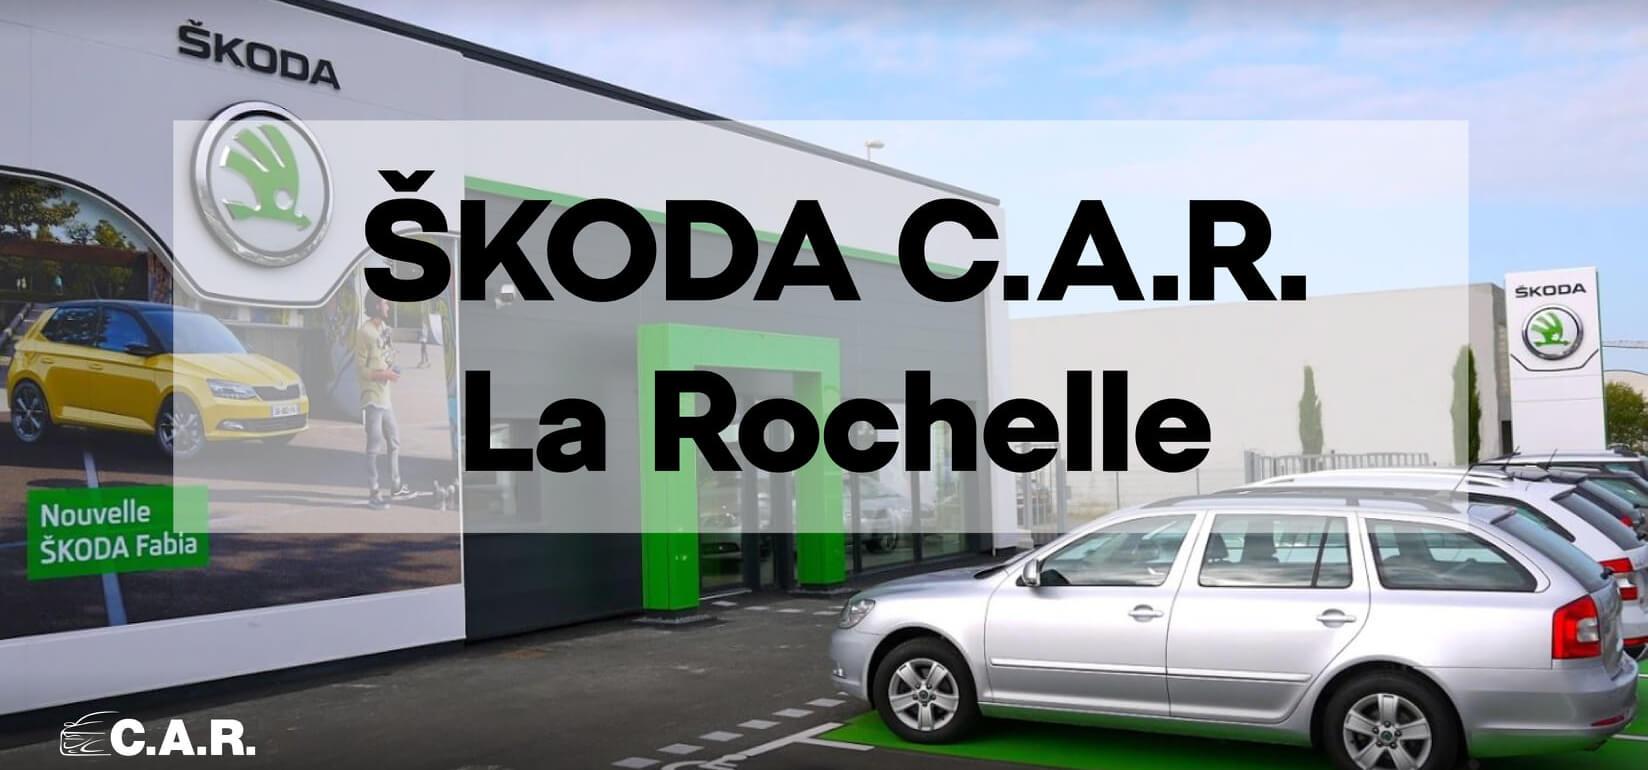 C.A.R. Skoda La Rochelle